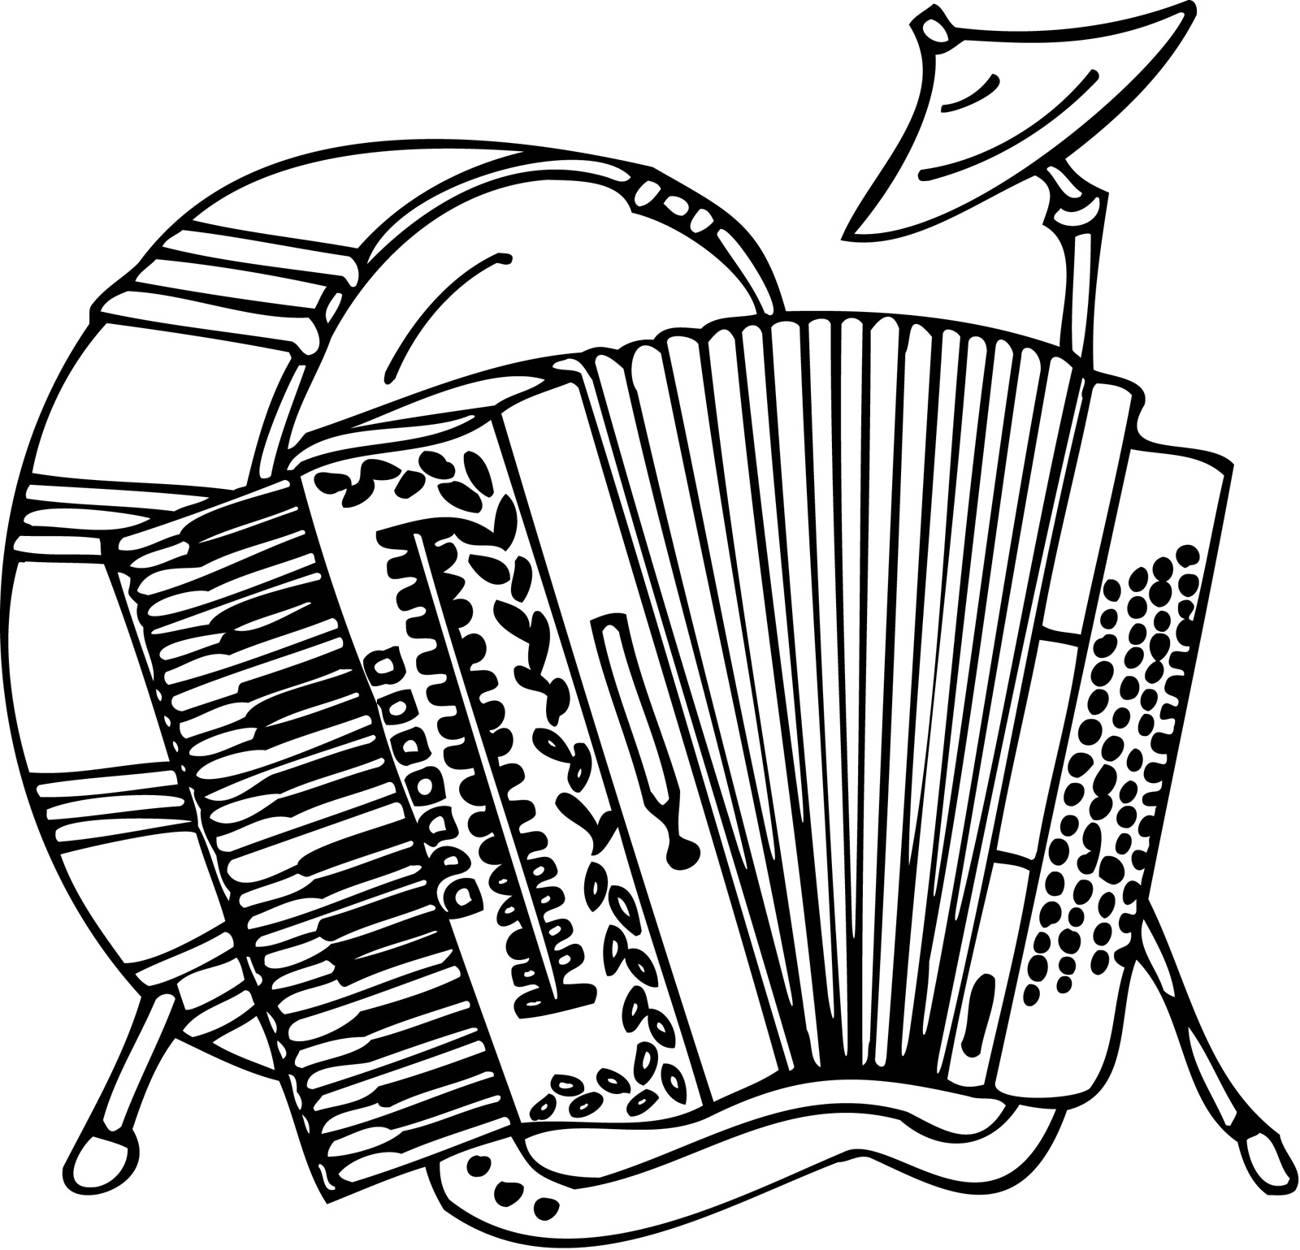 MUSIC-065